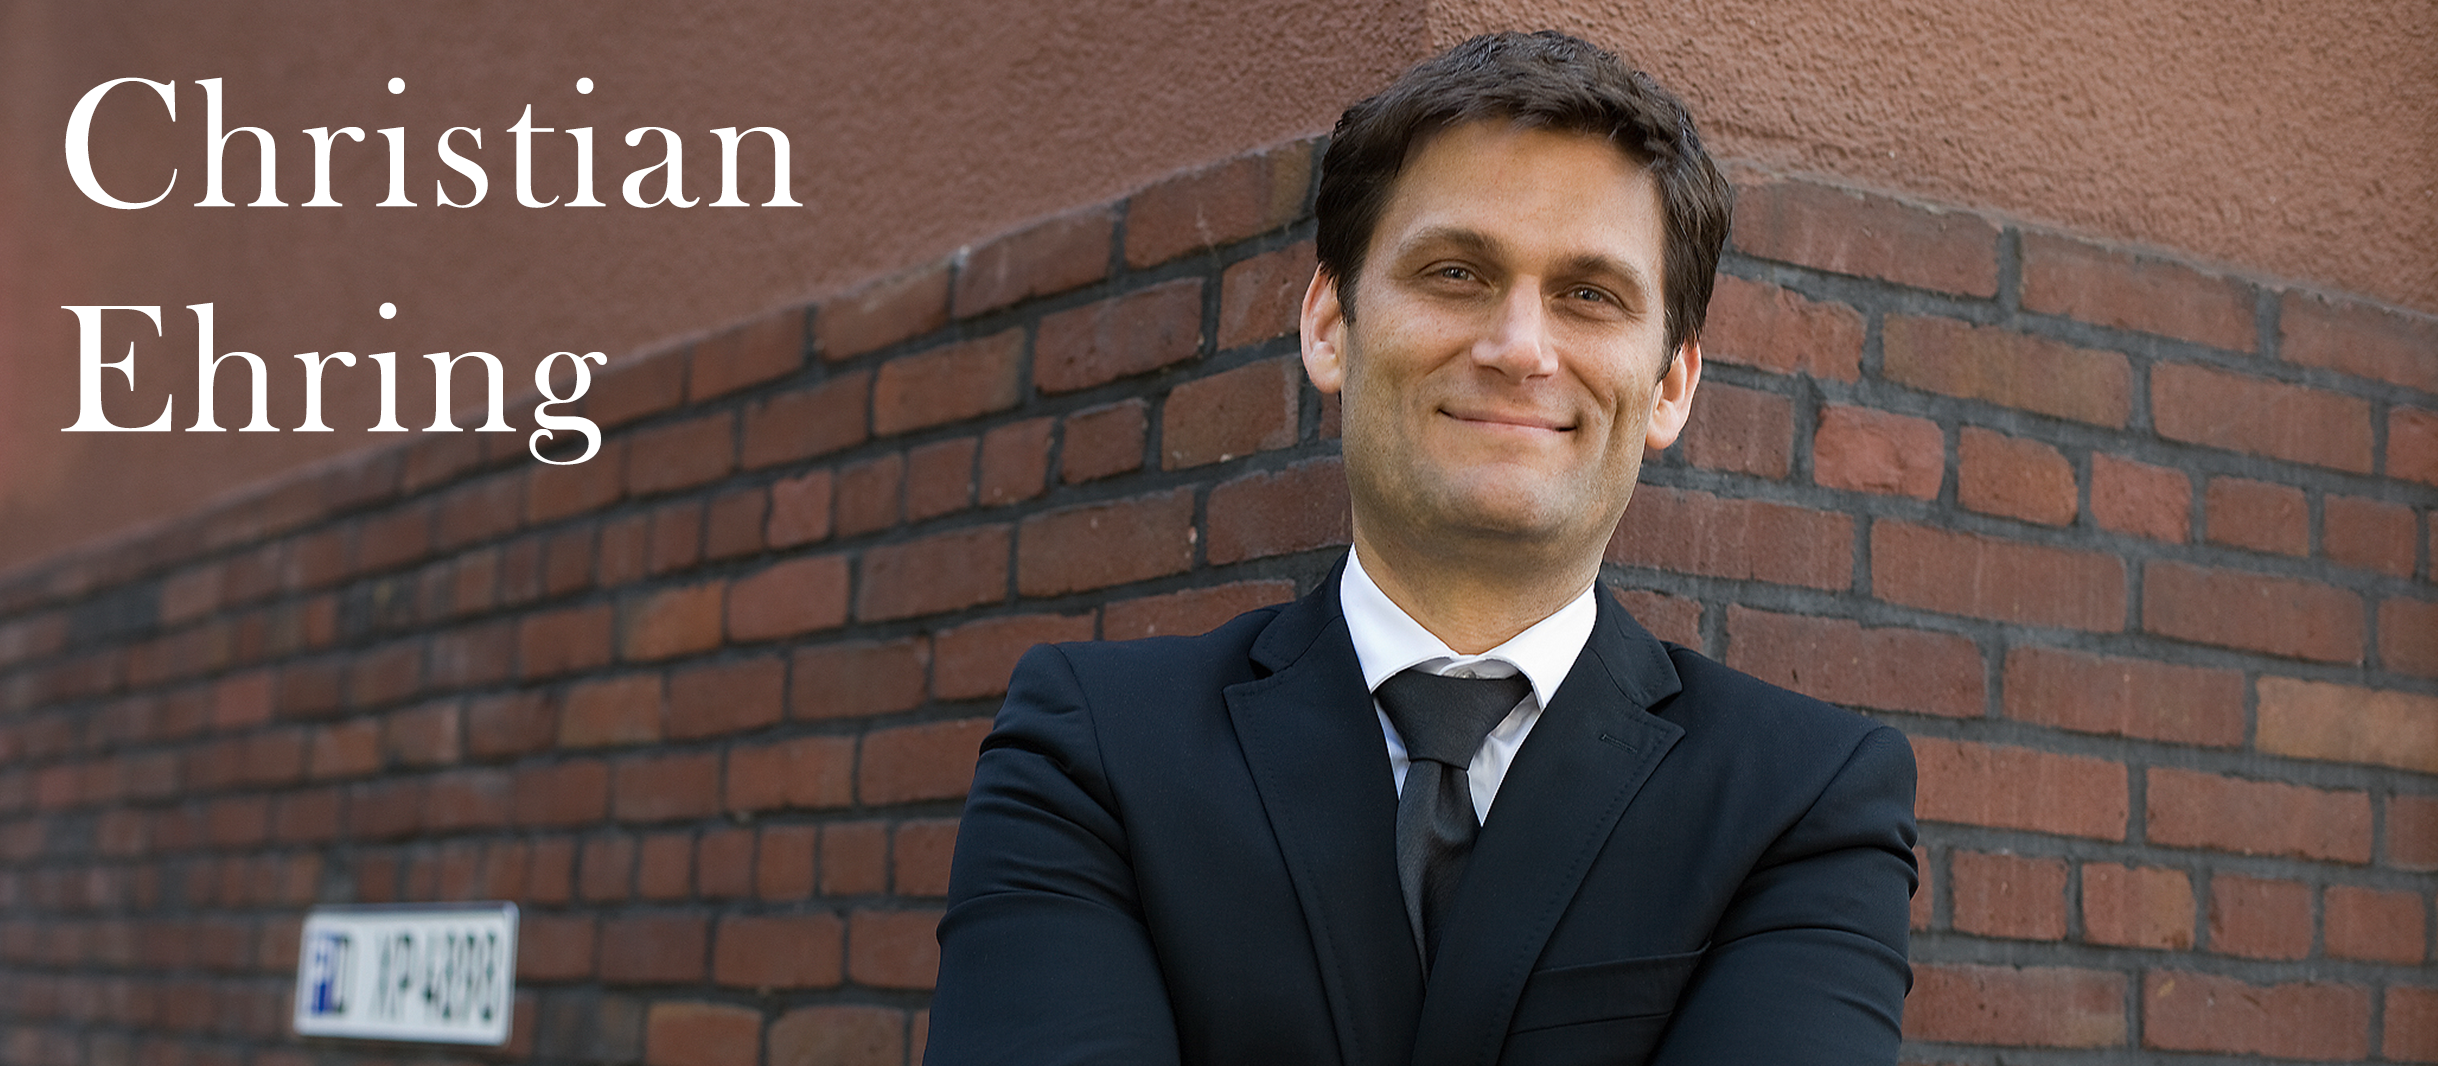 Christian Ehring lehnt lächelnd an einer roten Mauer